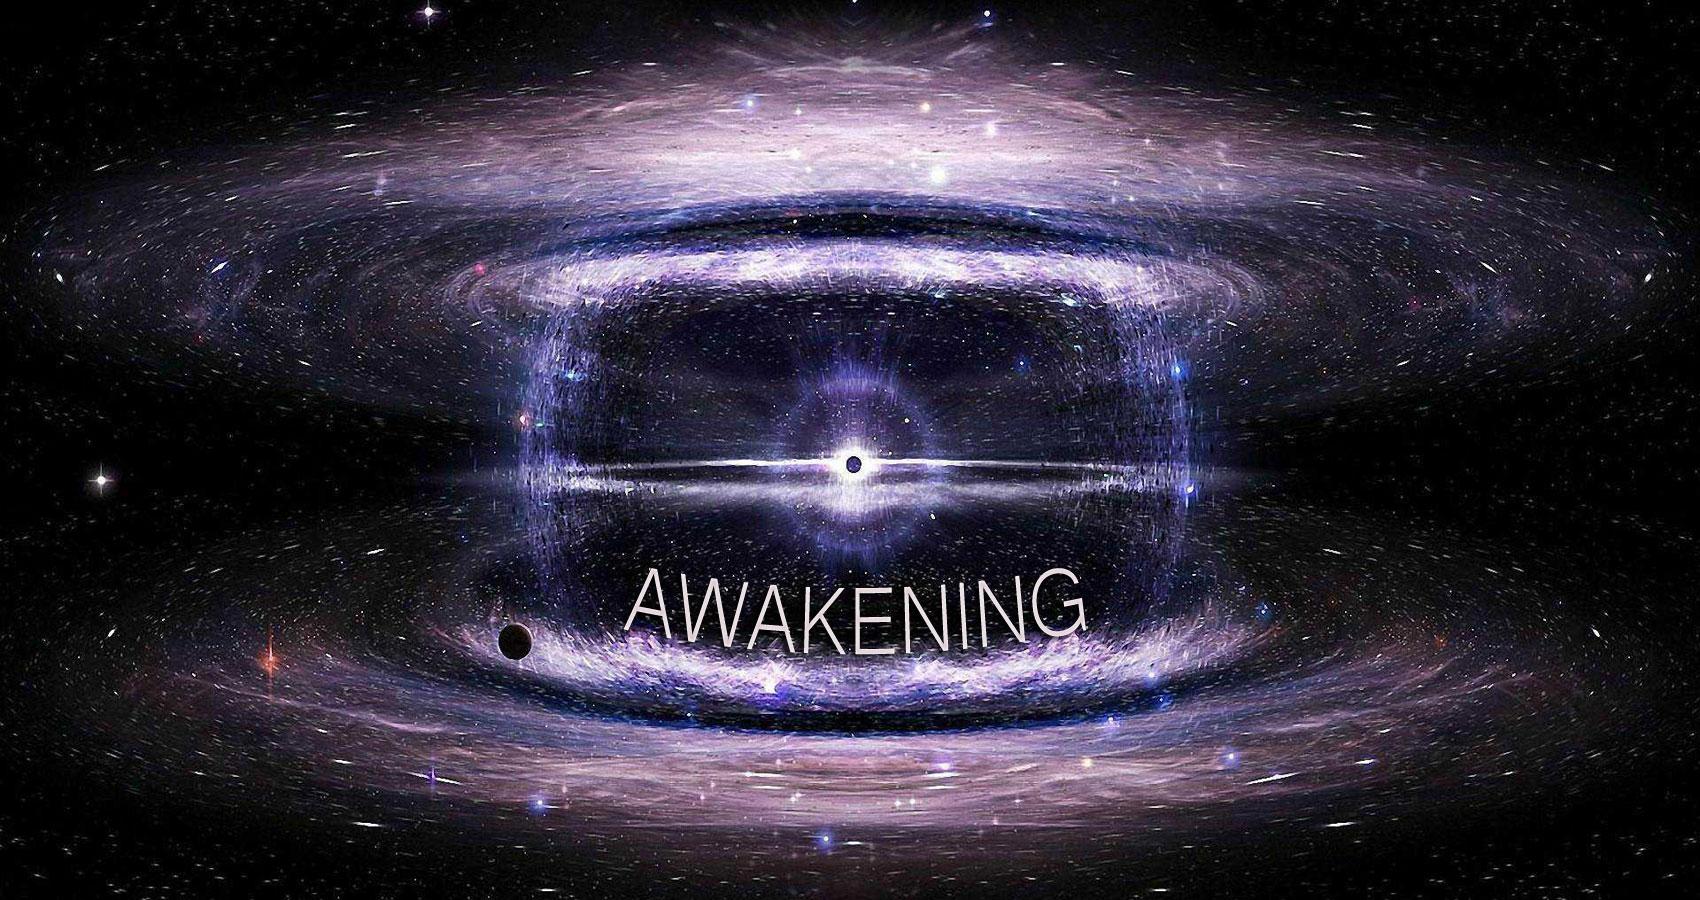 Awakening by Pablo Guimaraes at Spillwords.com